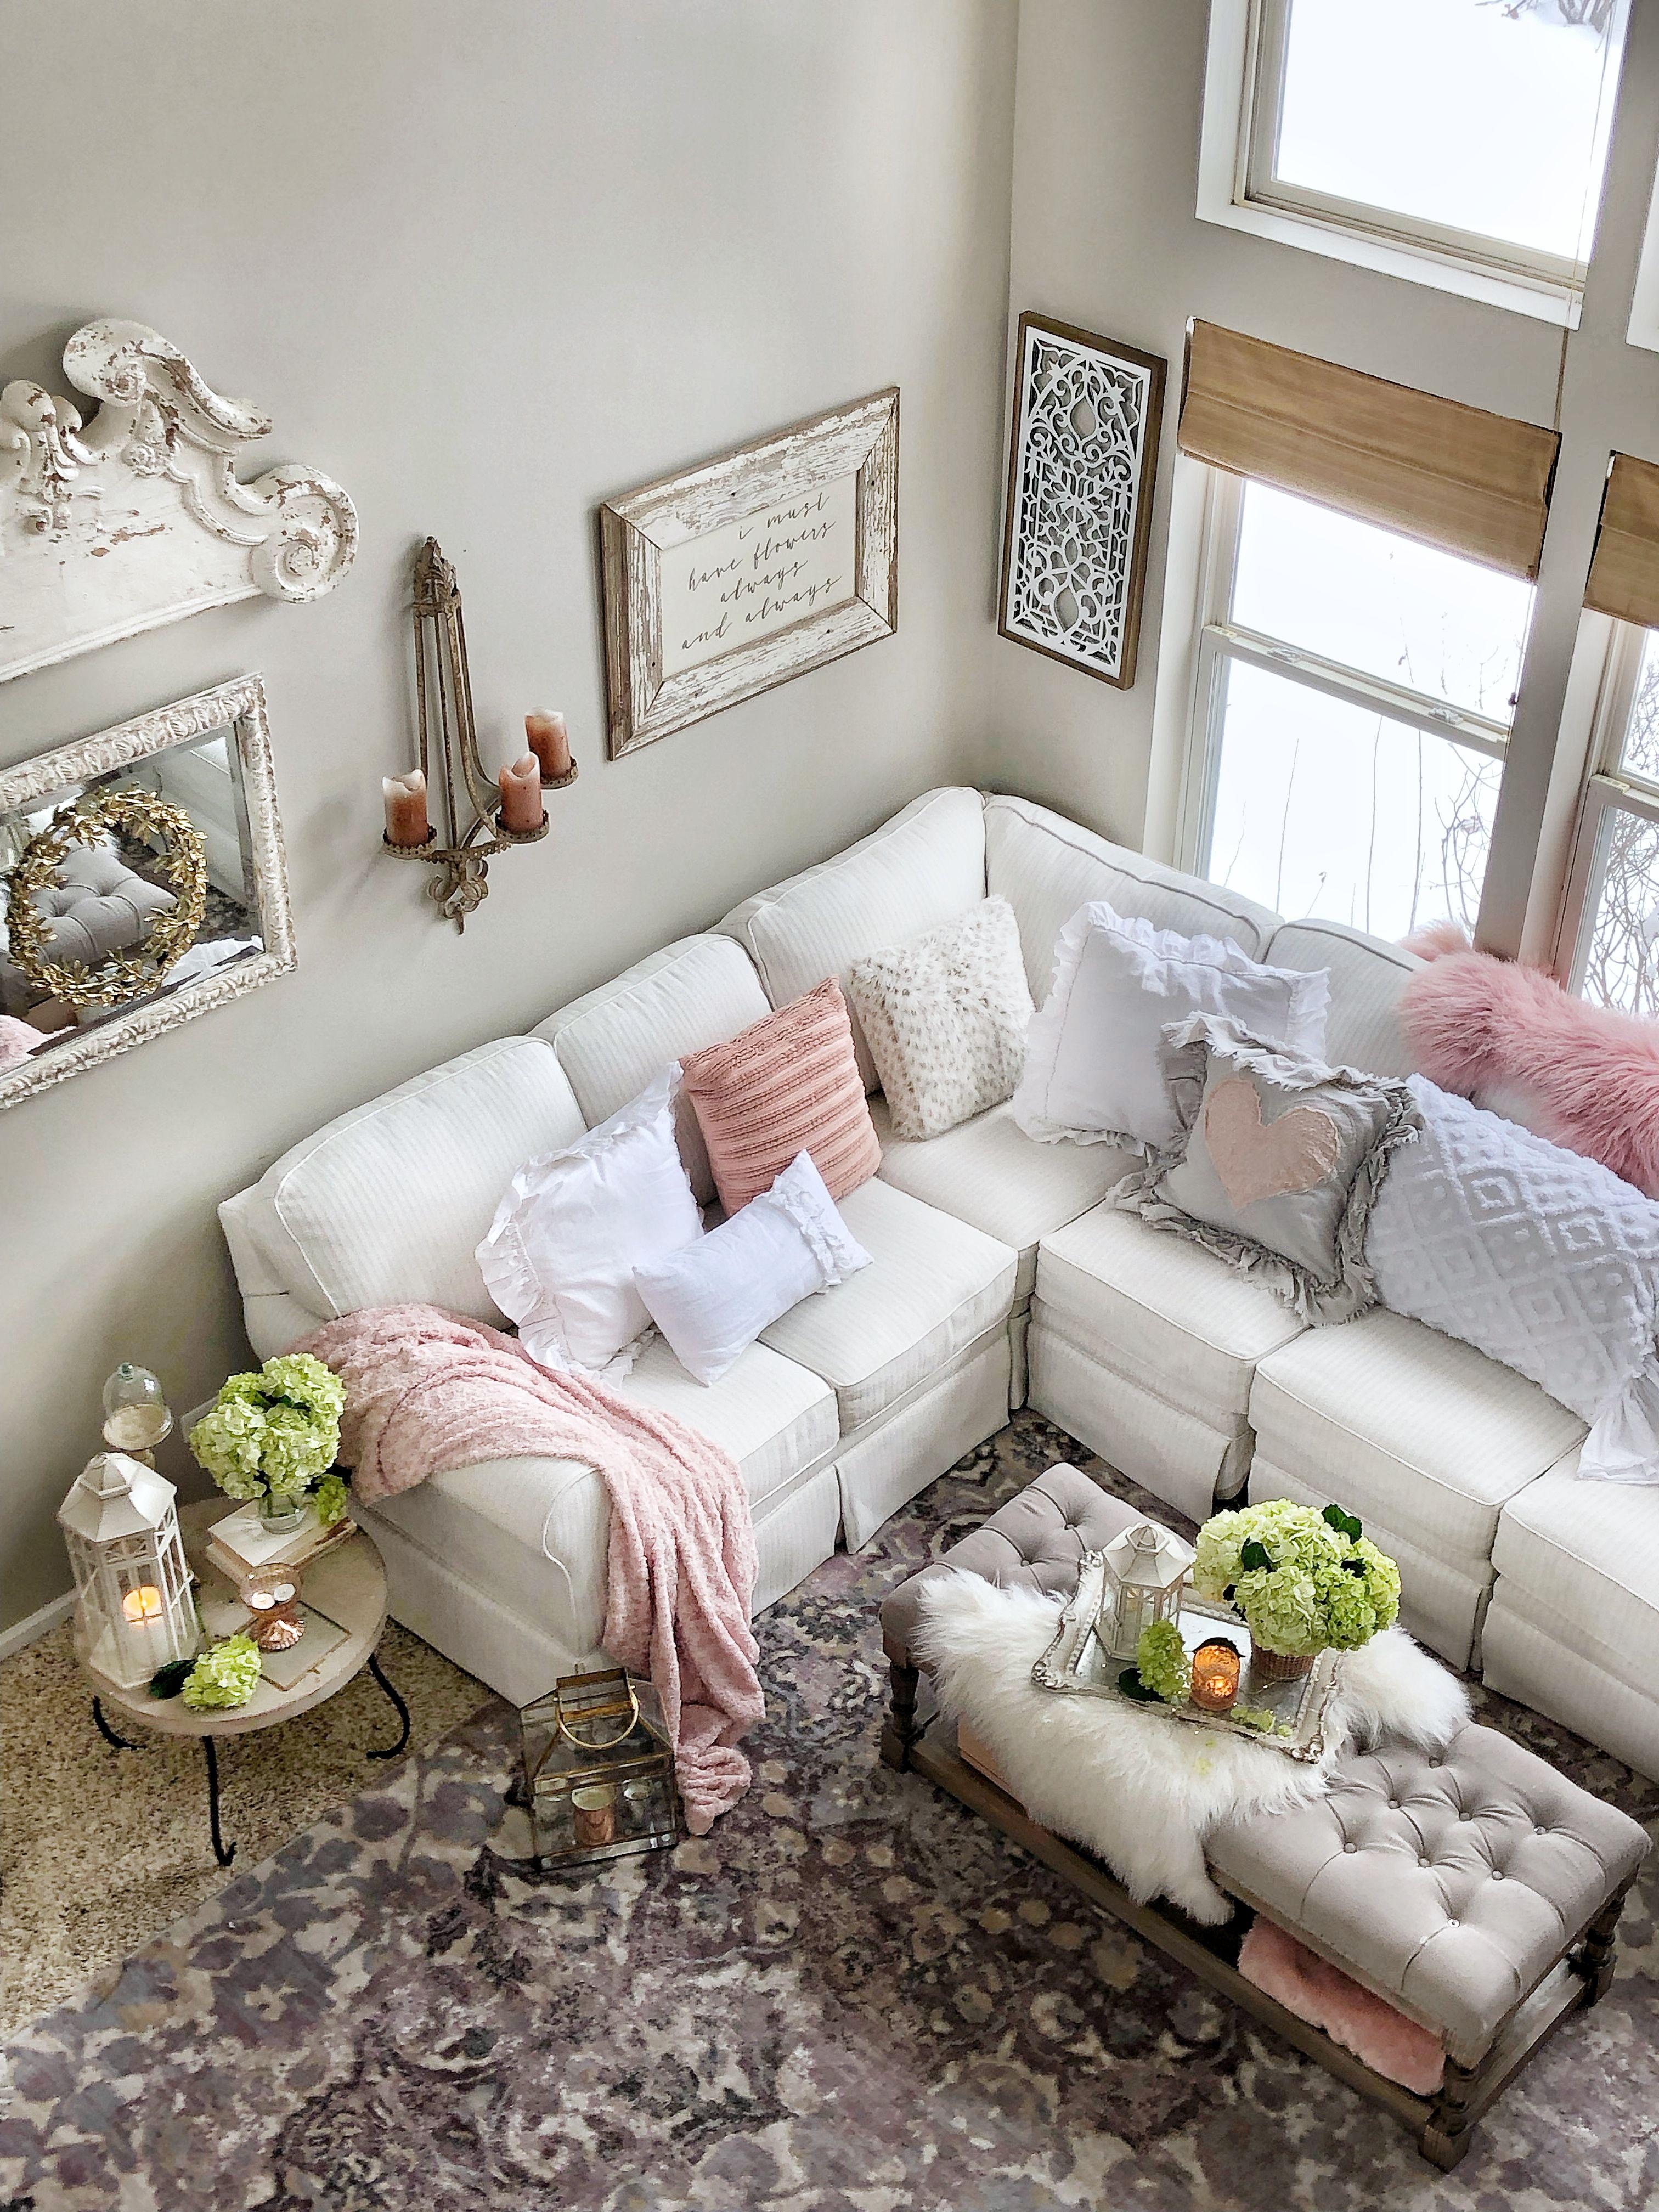 Flowers Hydrangeas Decorating Home Decor Living Room Decor Room Decor Living Decor Home Decor